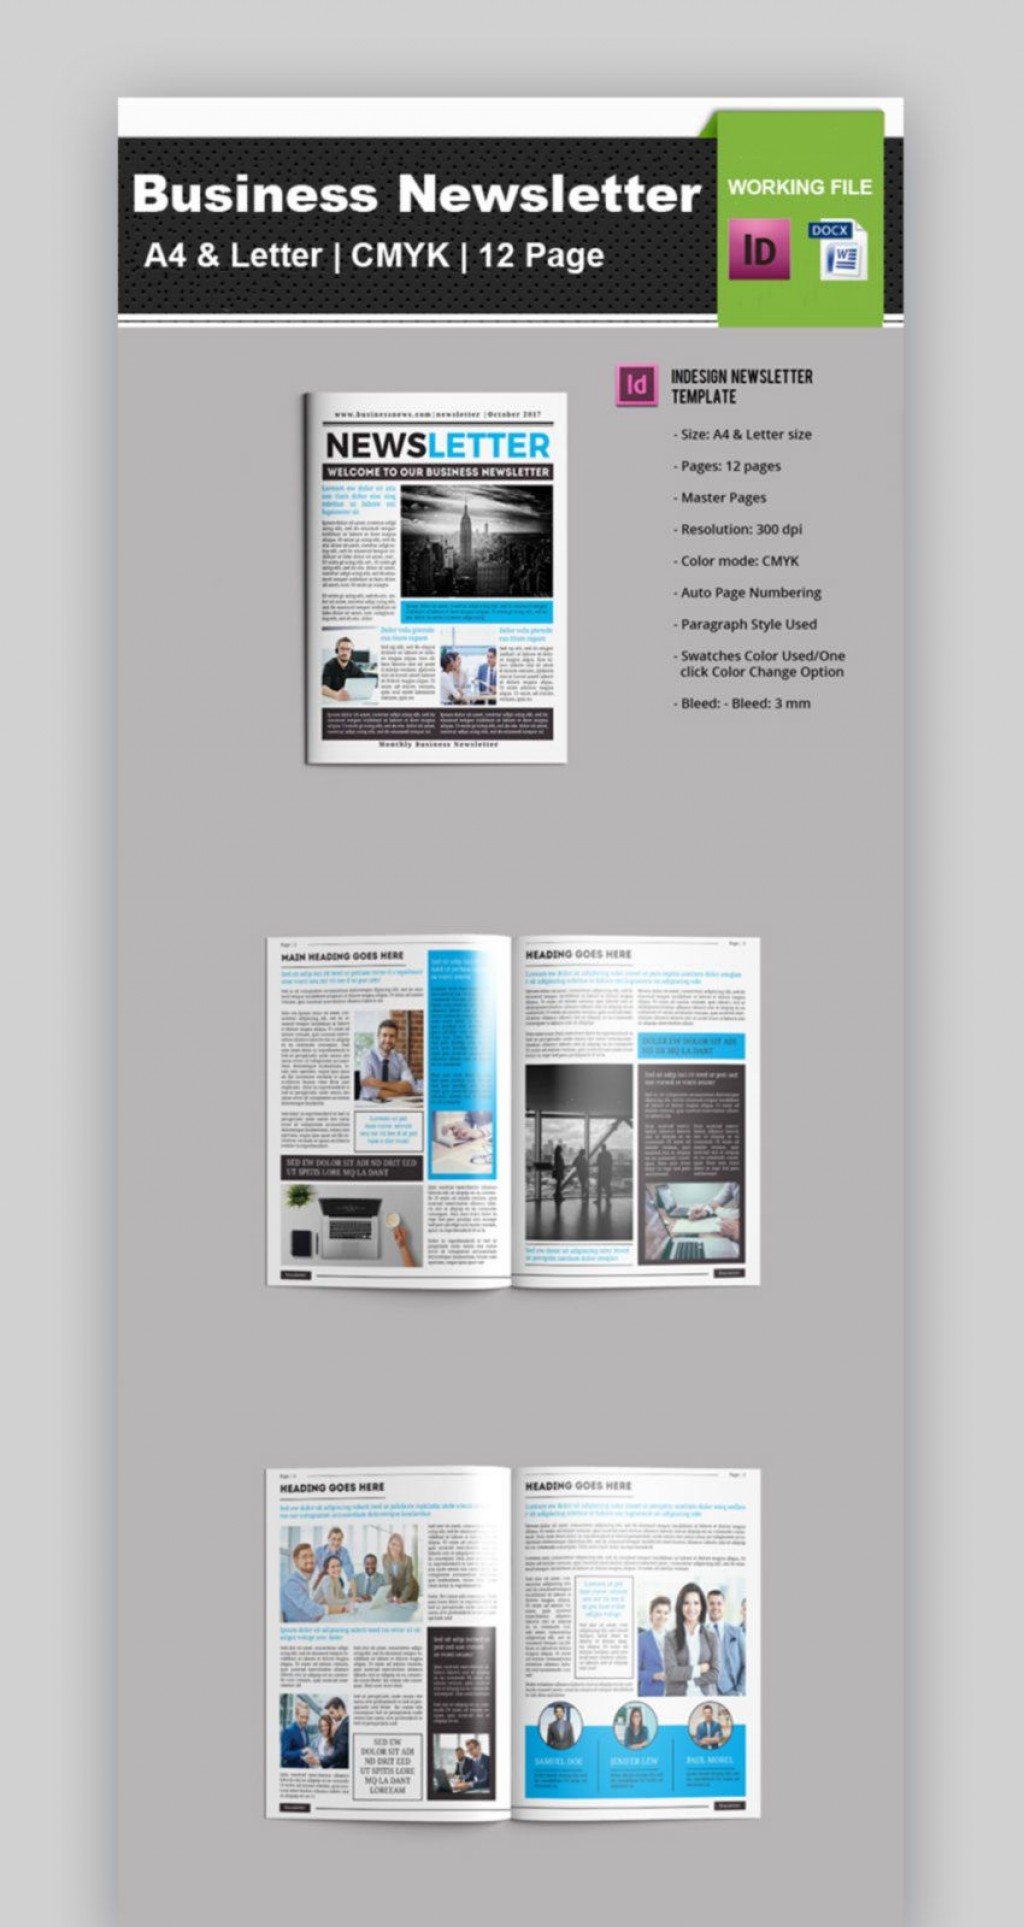 006 Sensational Publisher Newsletter Template Free Inspiration  Microsoft Office DownloadLarge